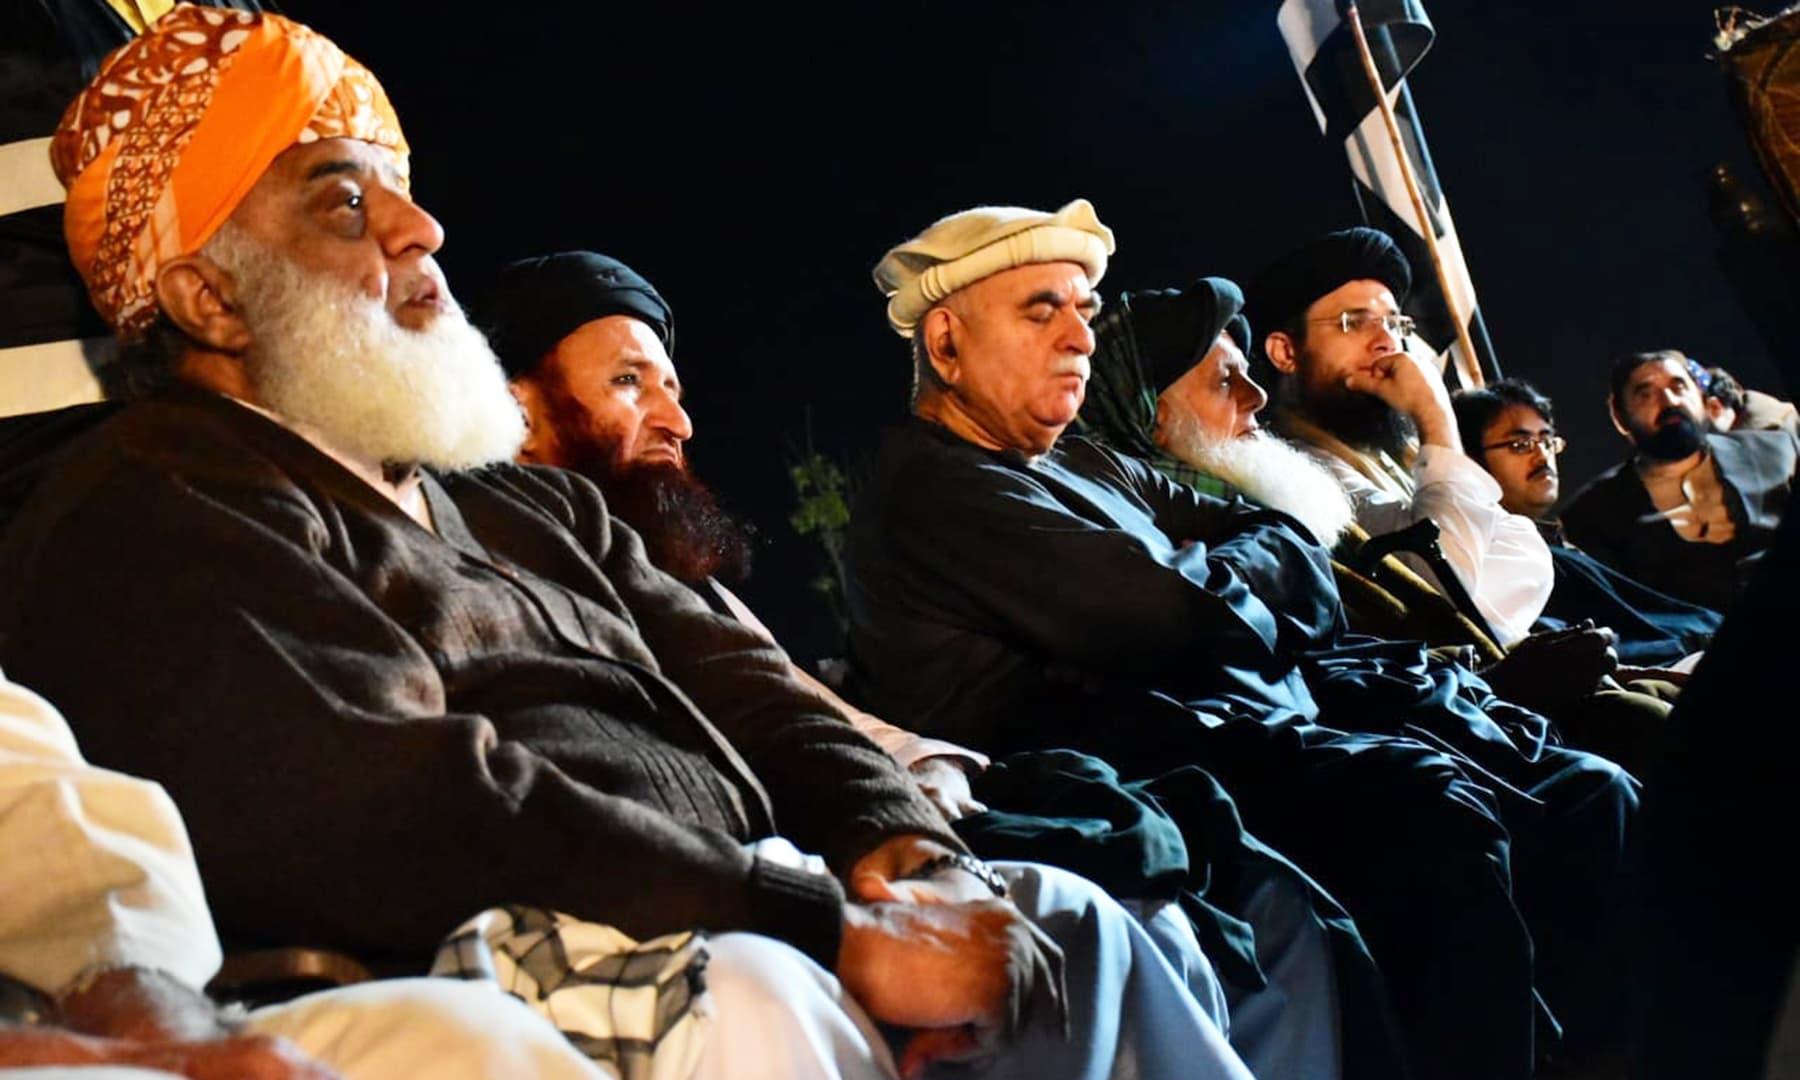 All photos courtesy Jamiat Ulama-e-Islam Pakistan Facebook page